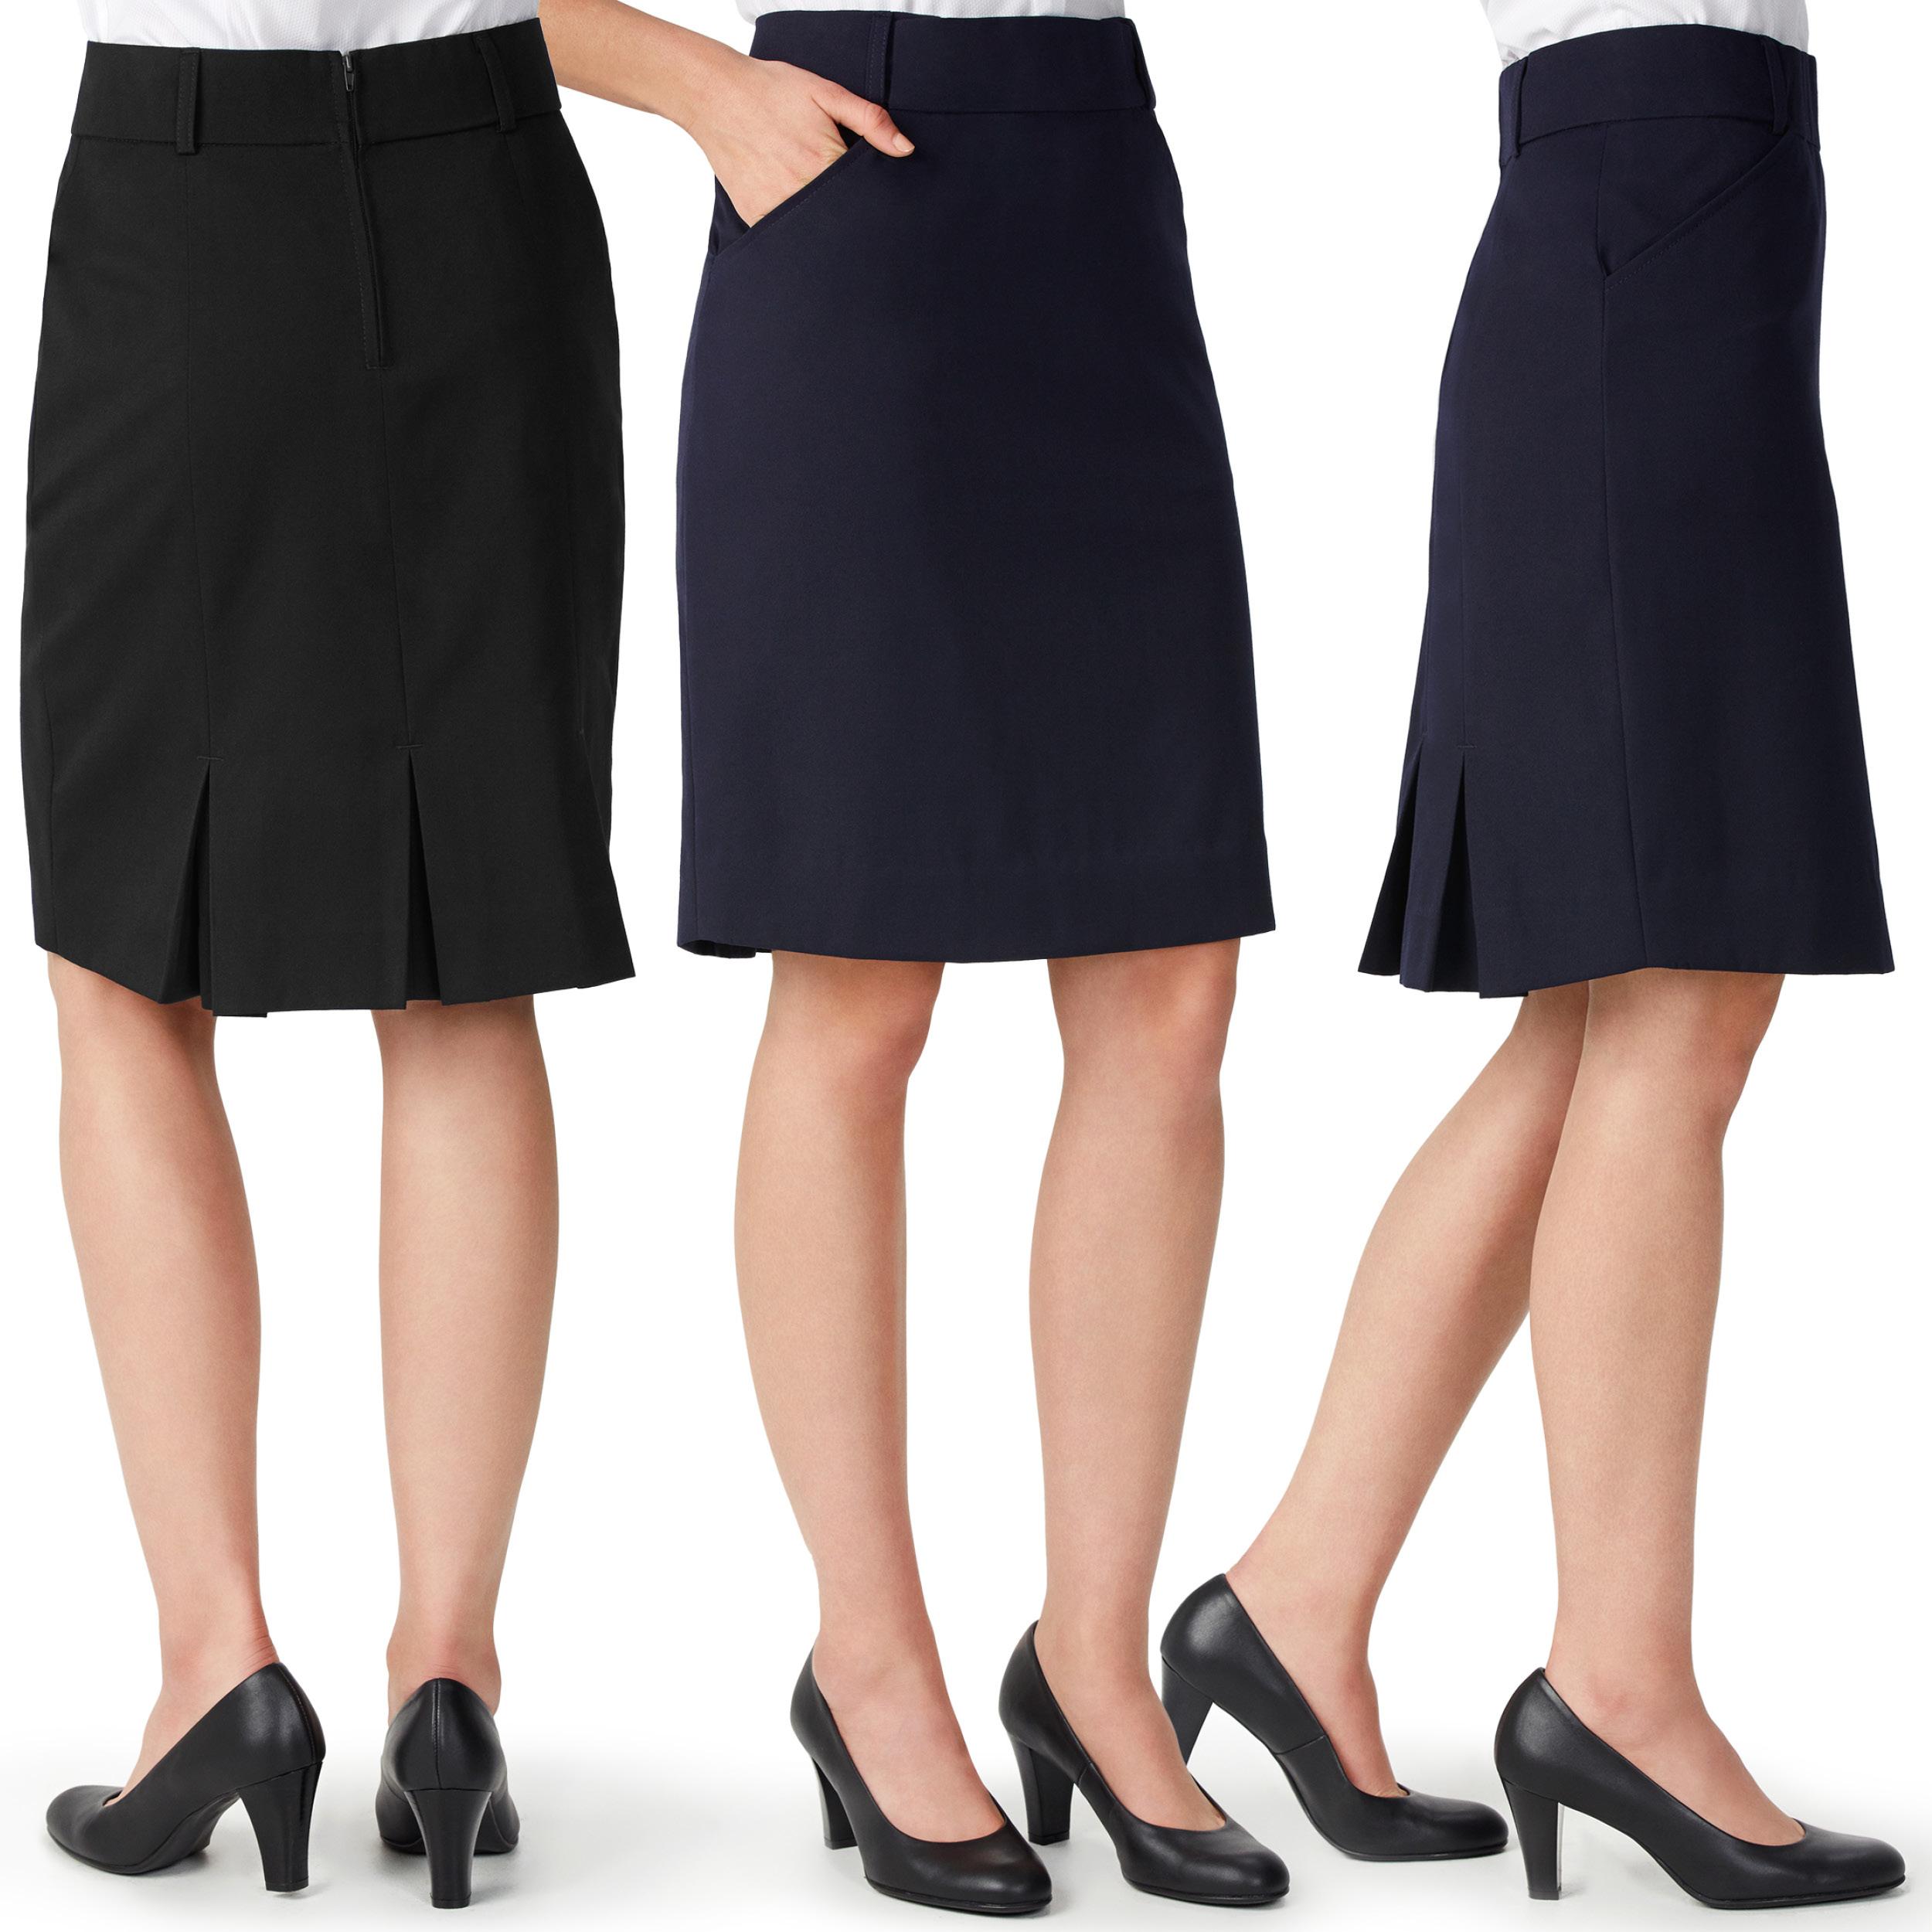 Biz Collection Skirts